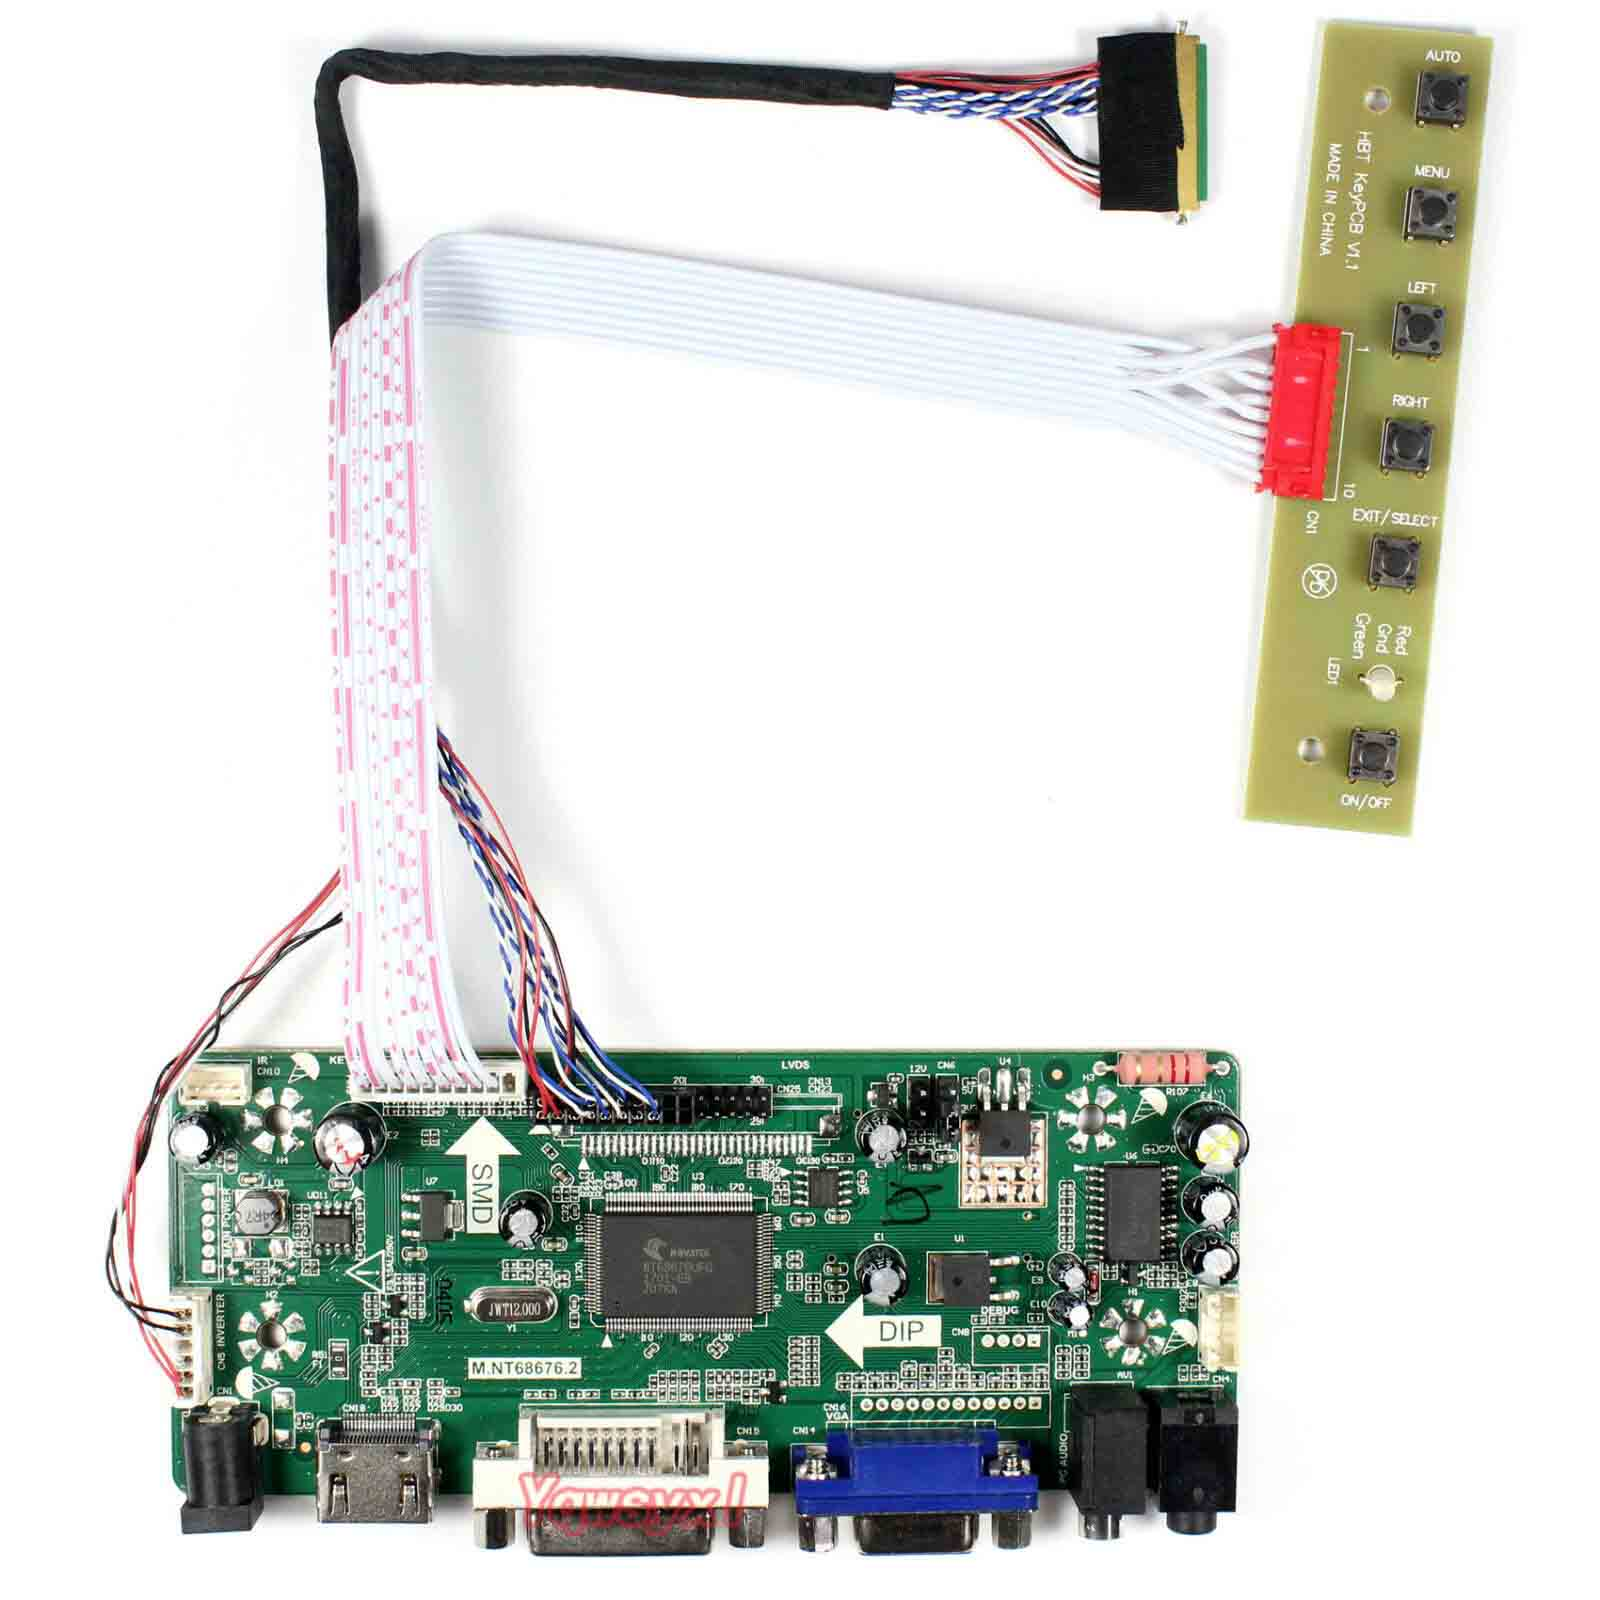 Yqwsyxl Control Board Monitor Kit For N156HGE-LB1 HDMI+DVI+VGA LCD LED Screen Controller Board Driver